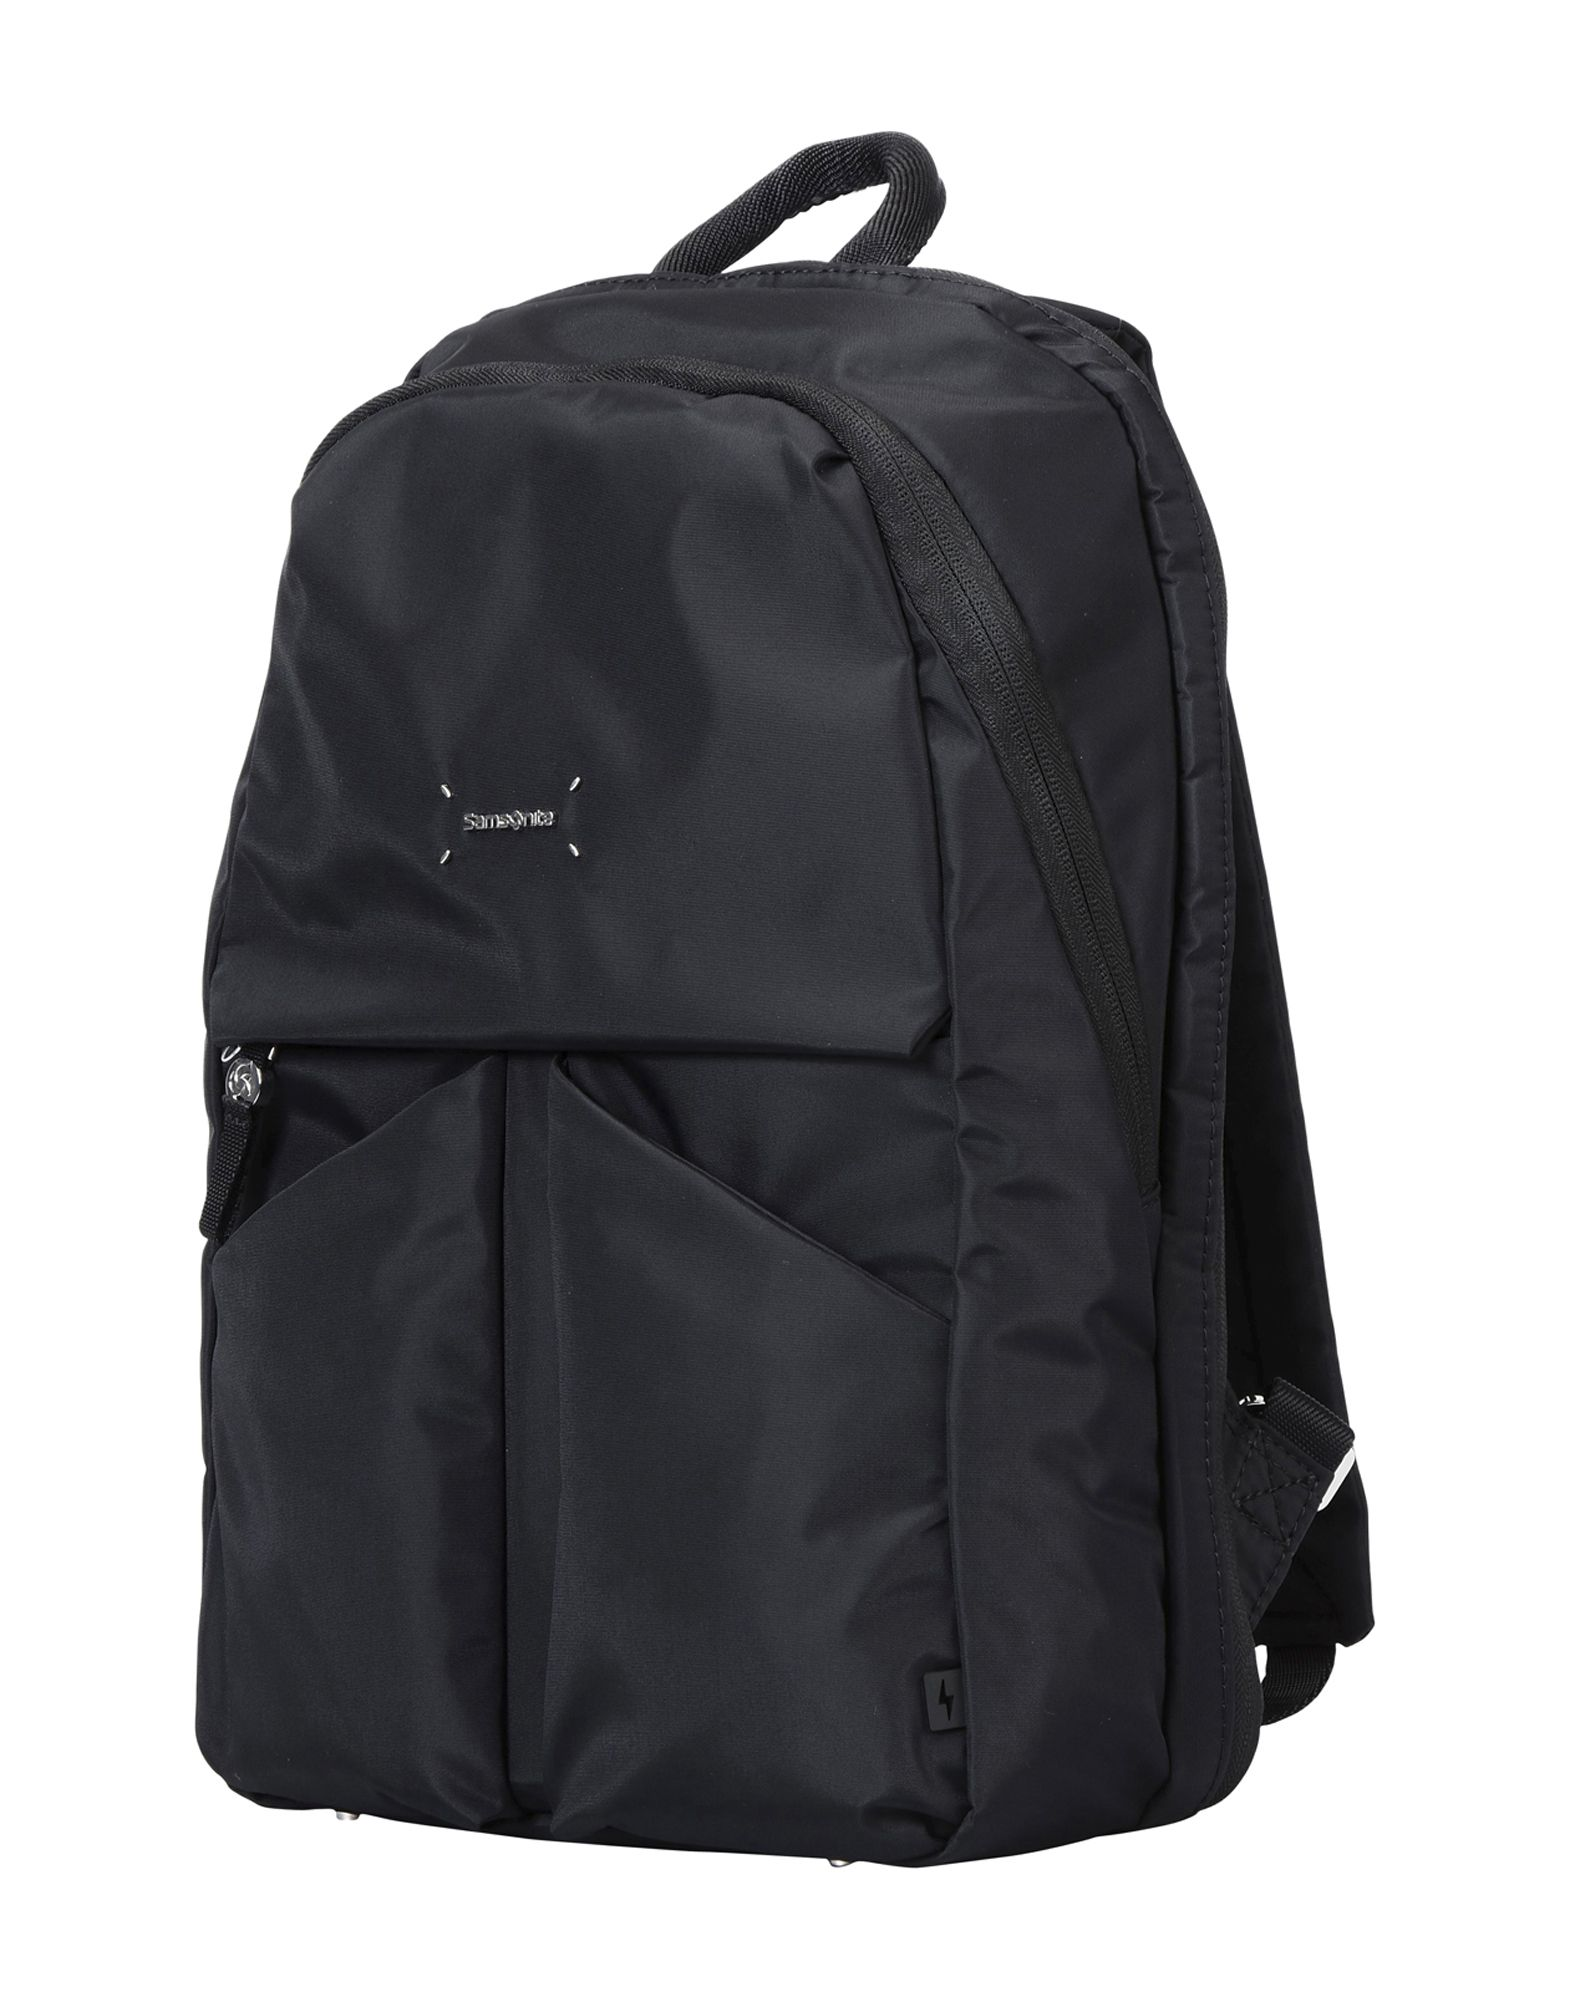 Zaini & Marsupi Samsonite Lady Tech Backpack 14.1 - Uomo - Acquista online su